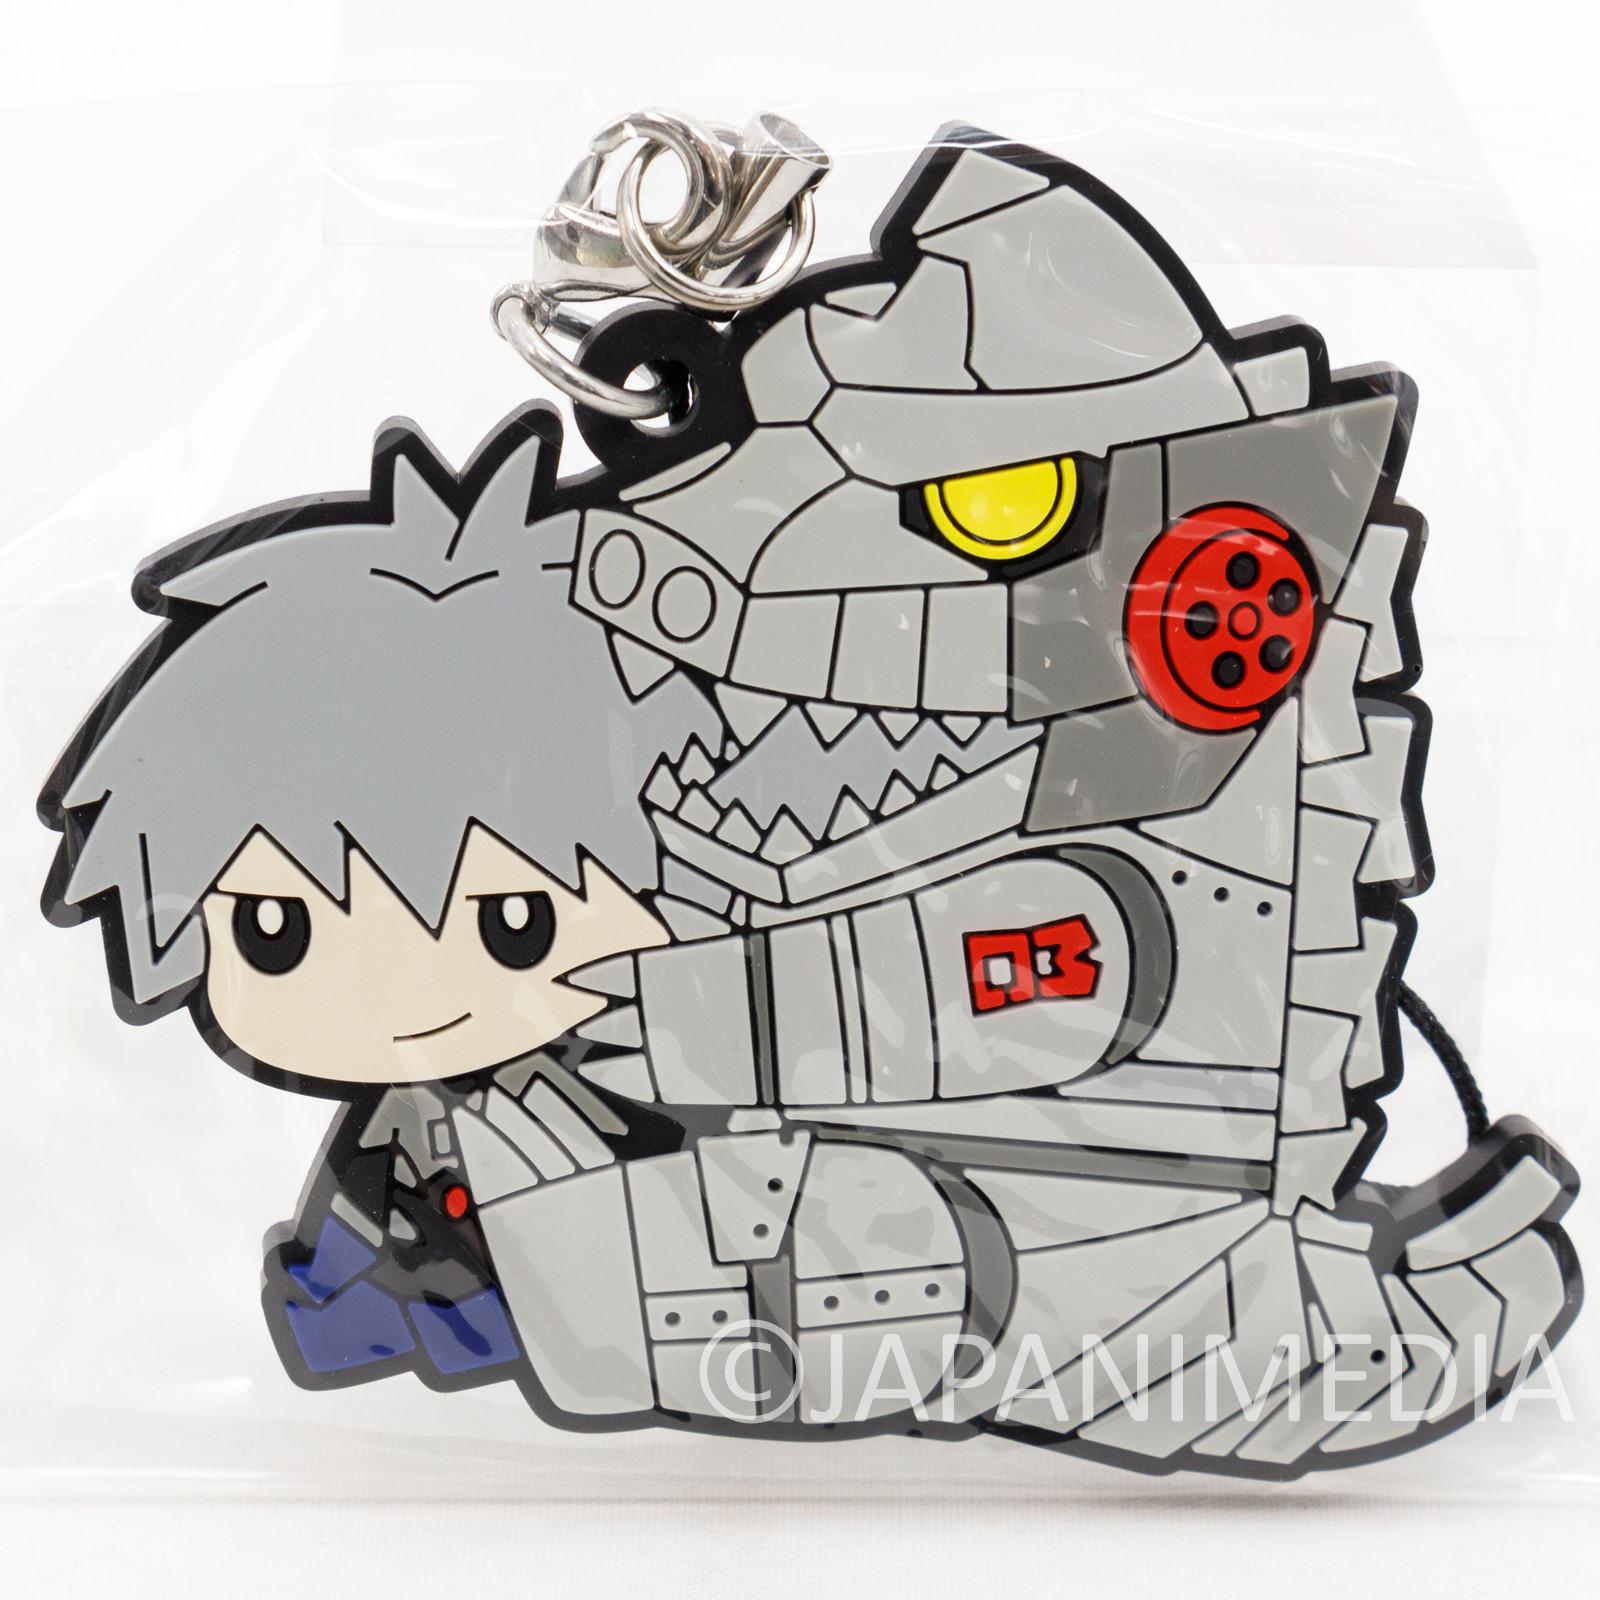 Evangelion Kaworu Nagisa x MechaGodzilla Mascot Rubber Strap JAPAN 2